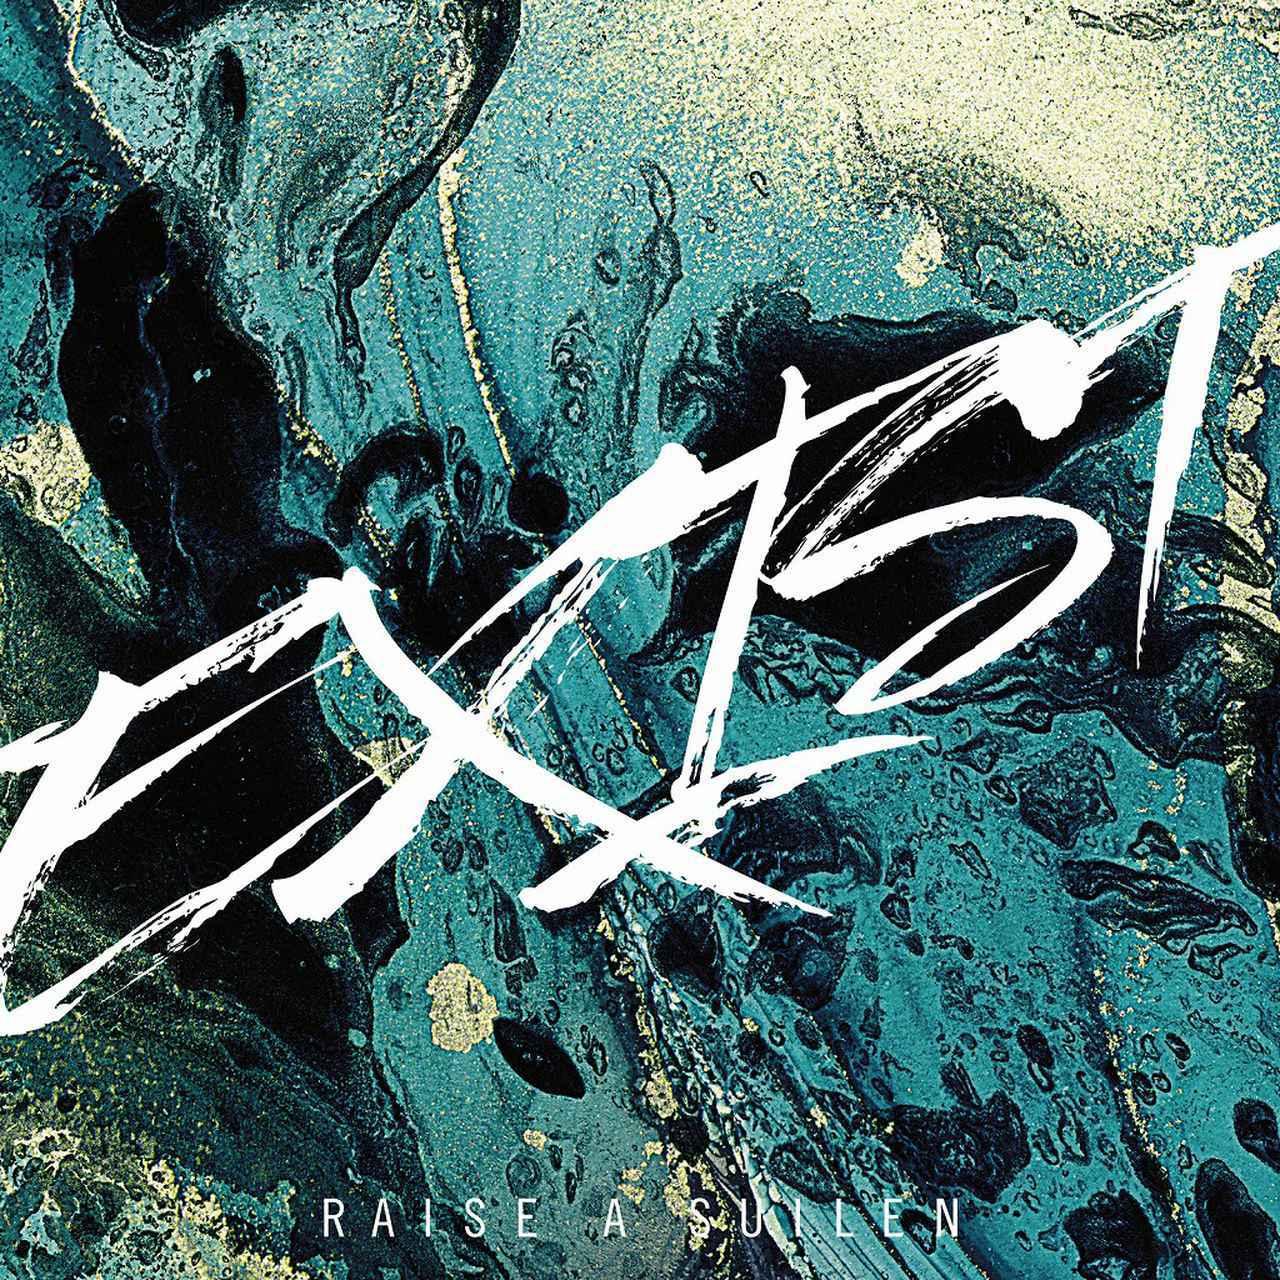 画像: EXIST / RAISE A SUILEN